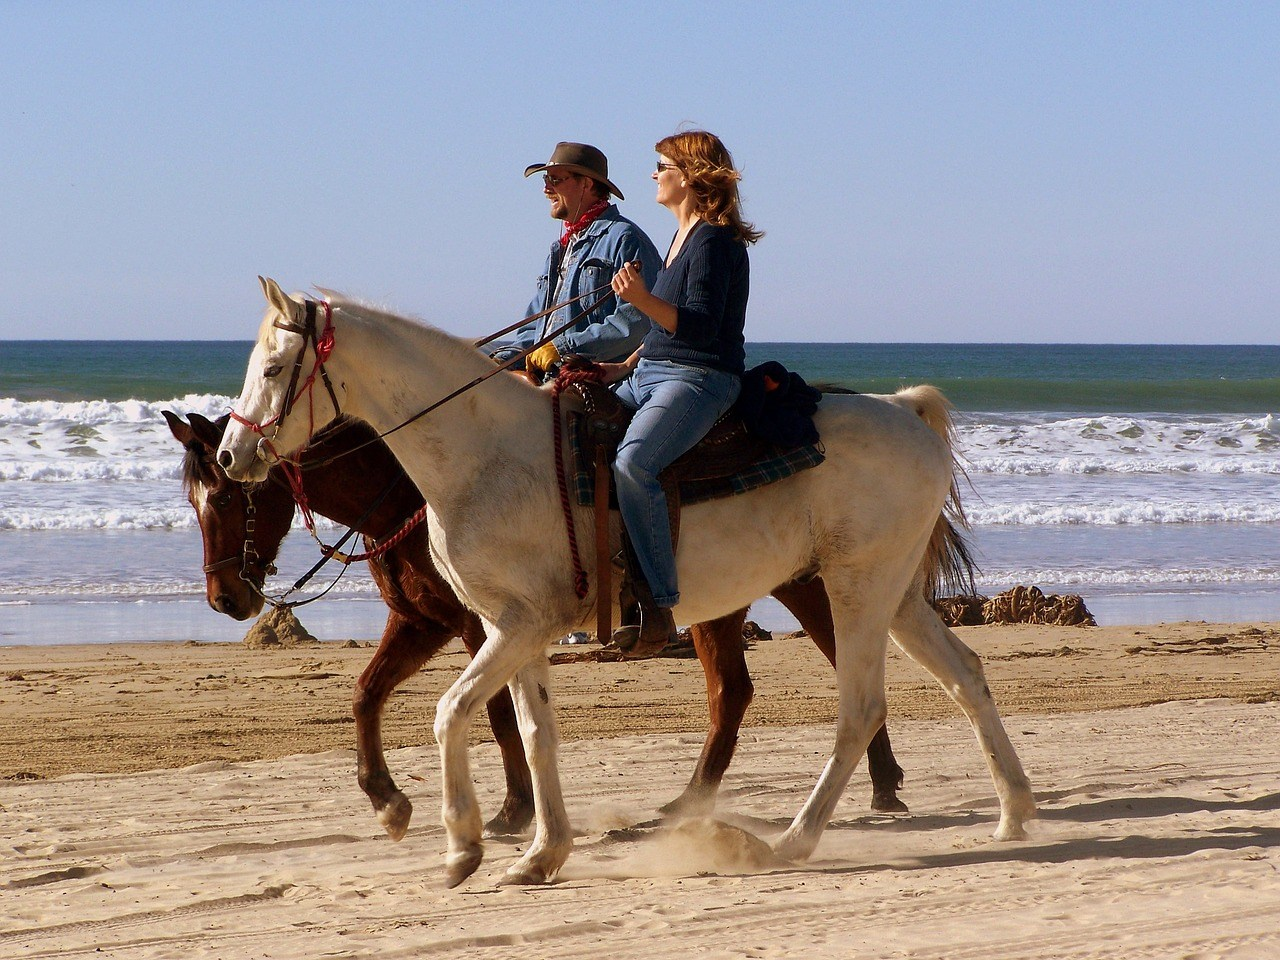 Horse Riding at the beach